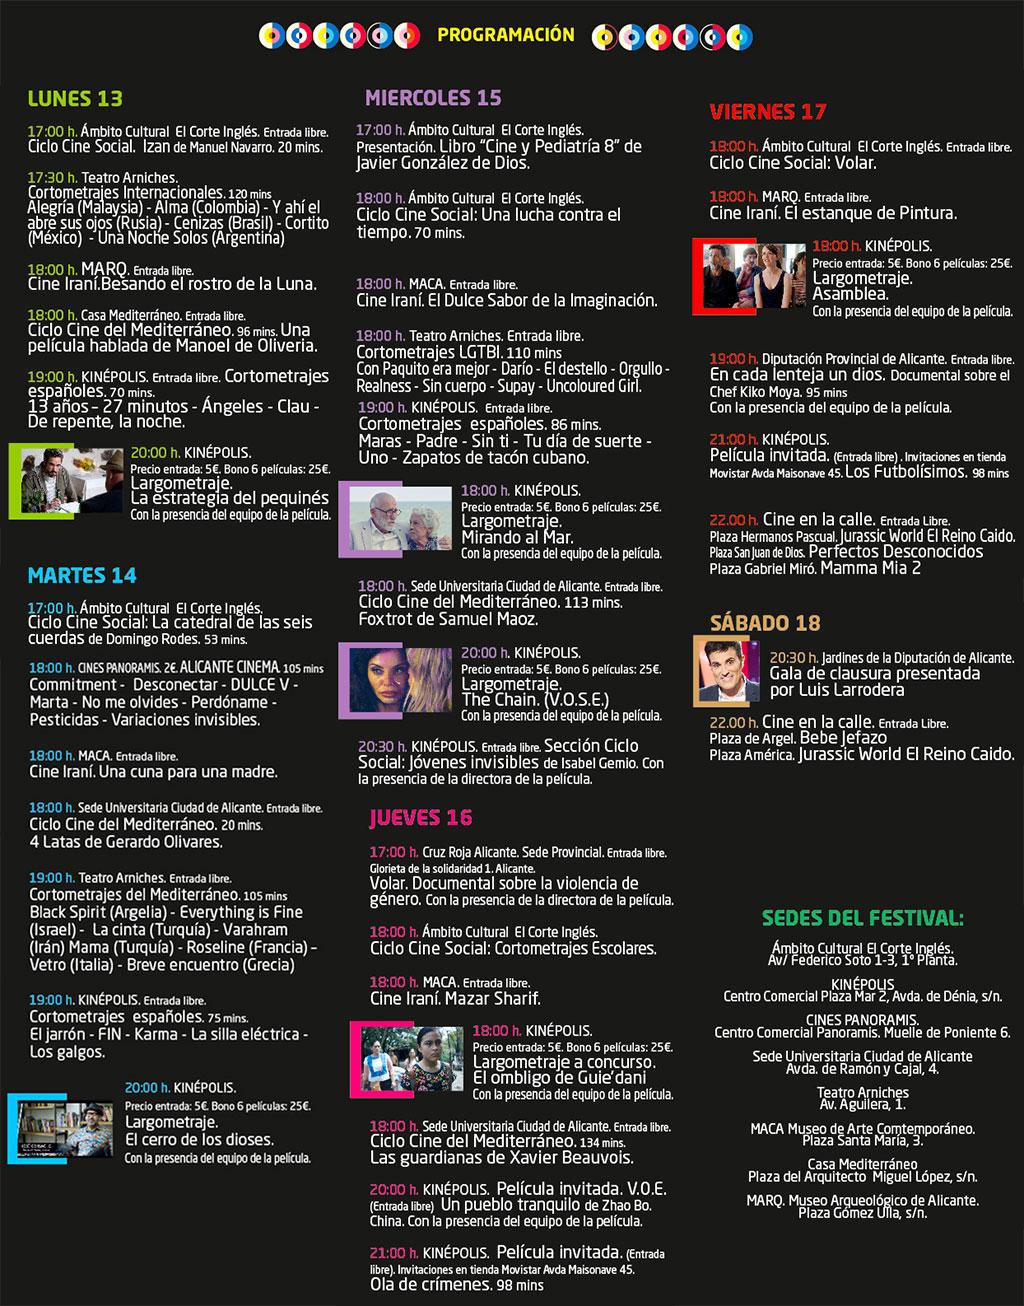 Festival de cine de Alicante 2019: programa